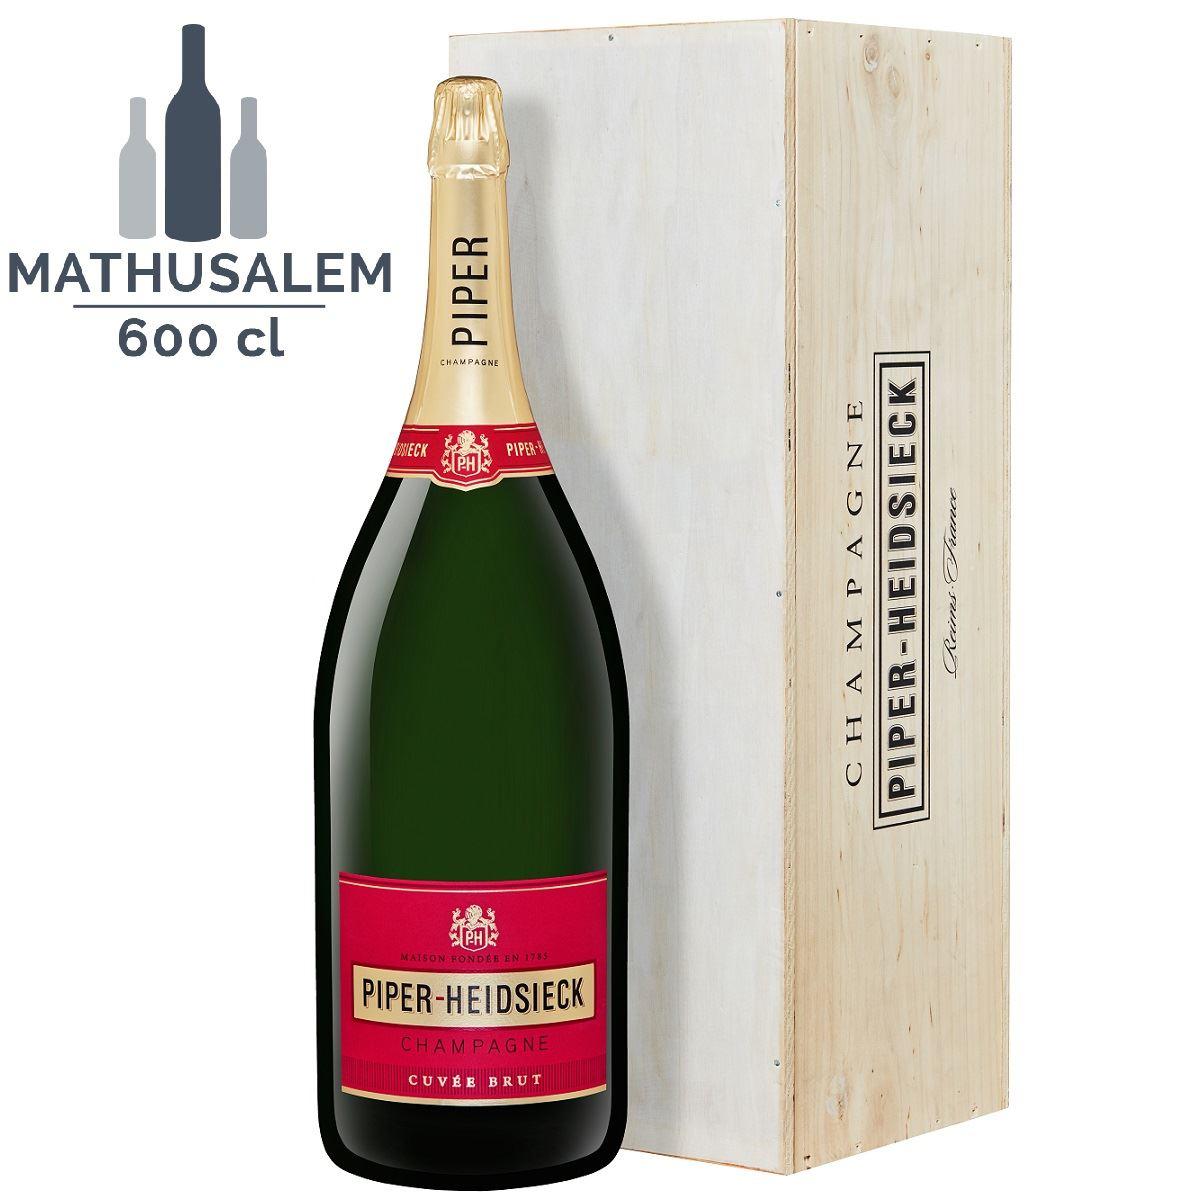 Champagne Mathusalem Piper-Heidsieck 6 litres